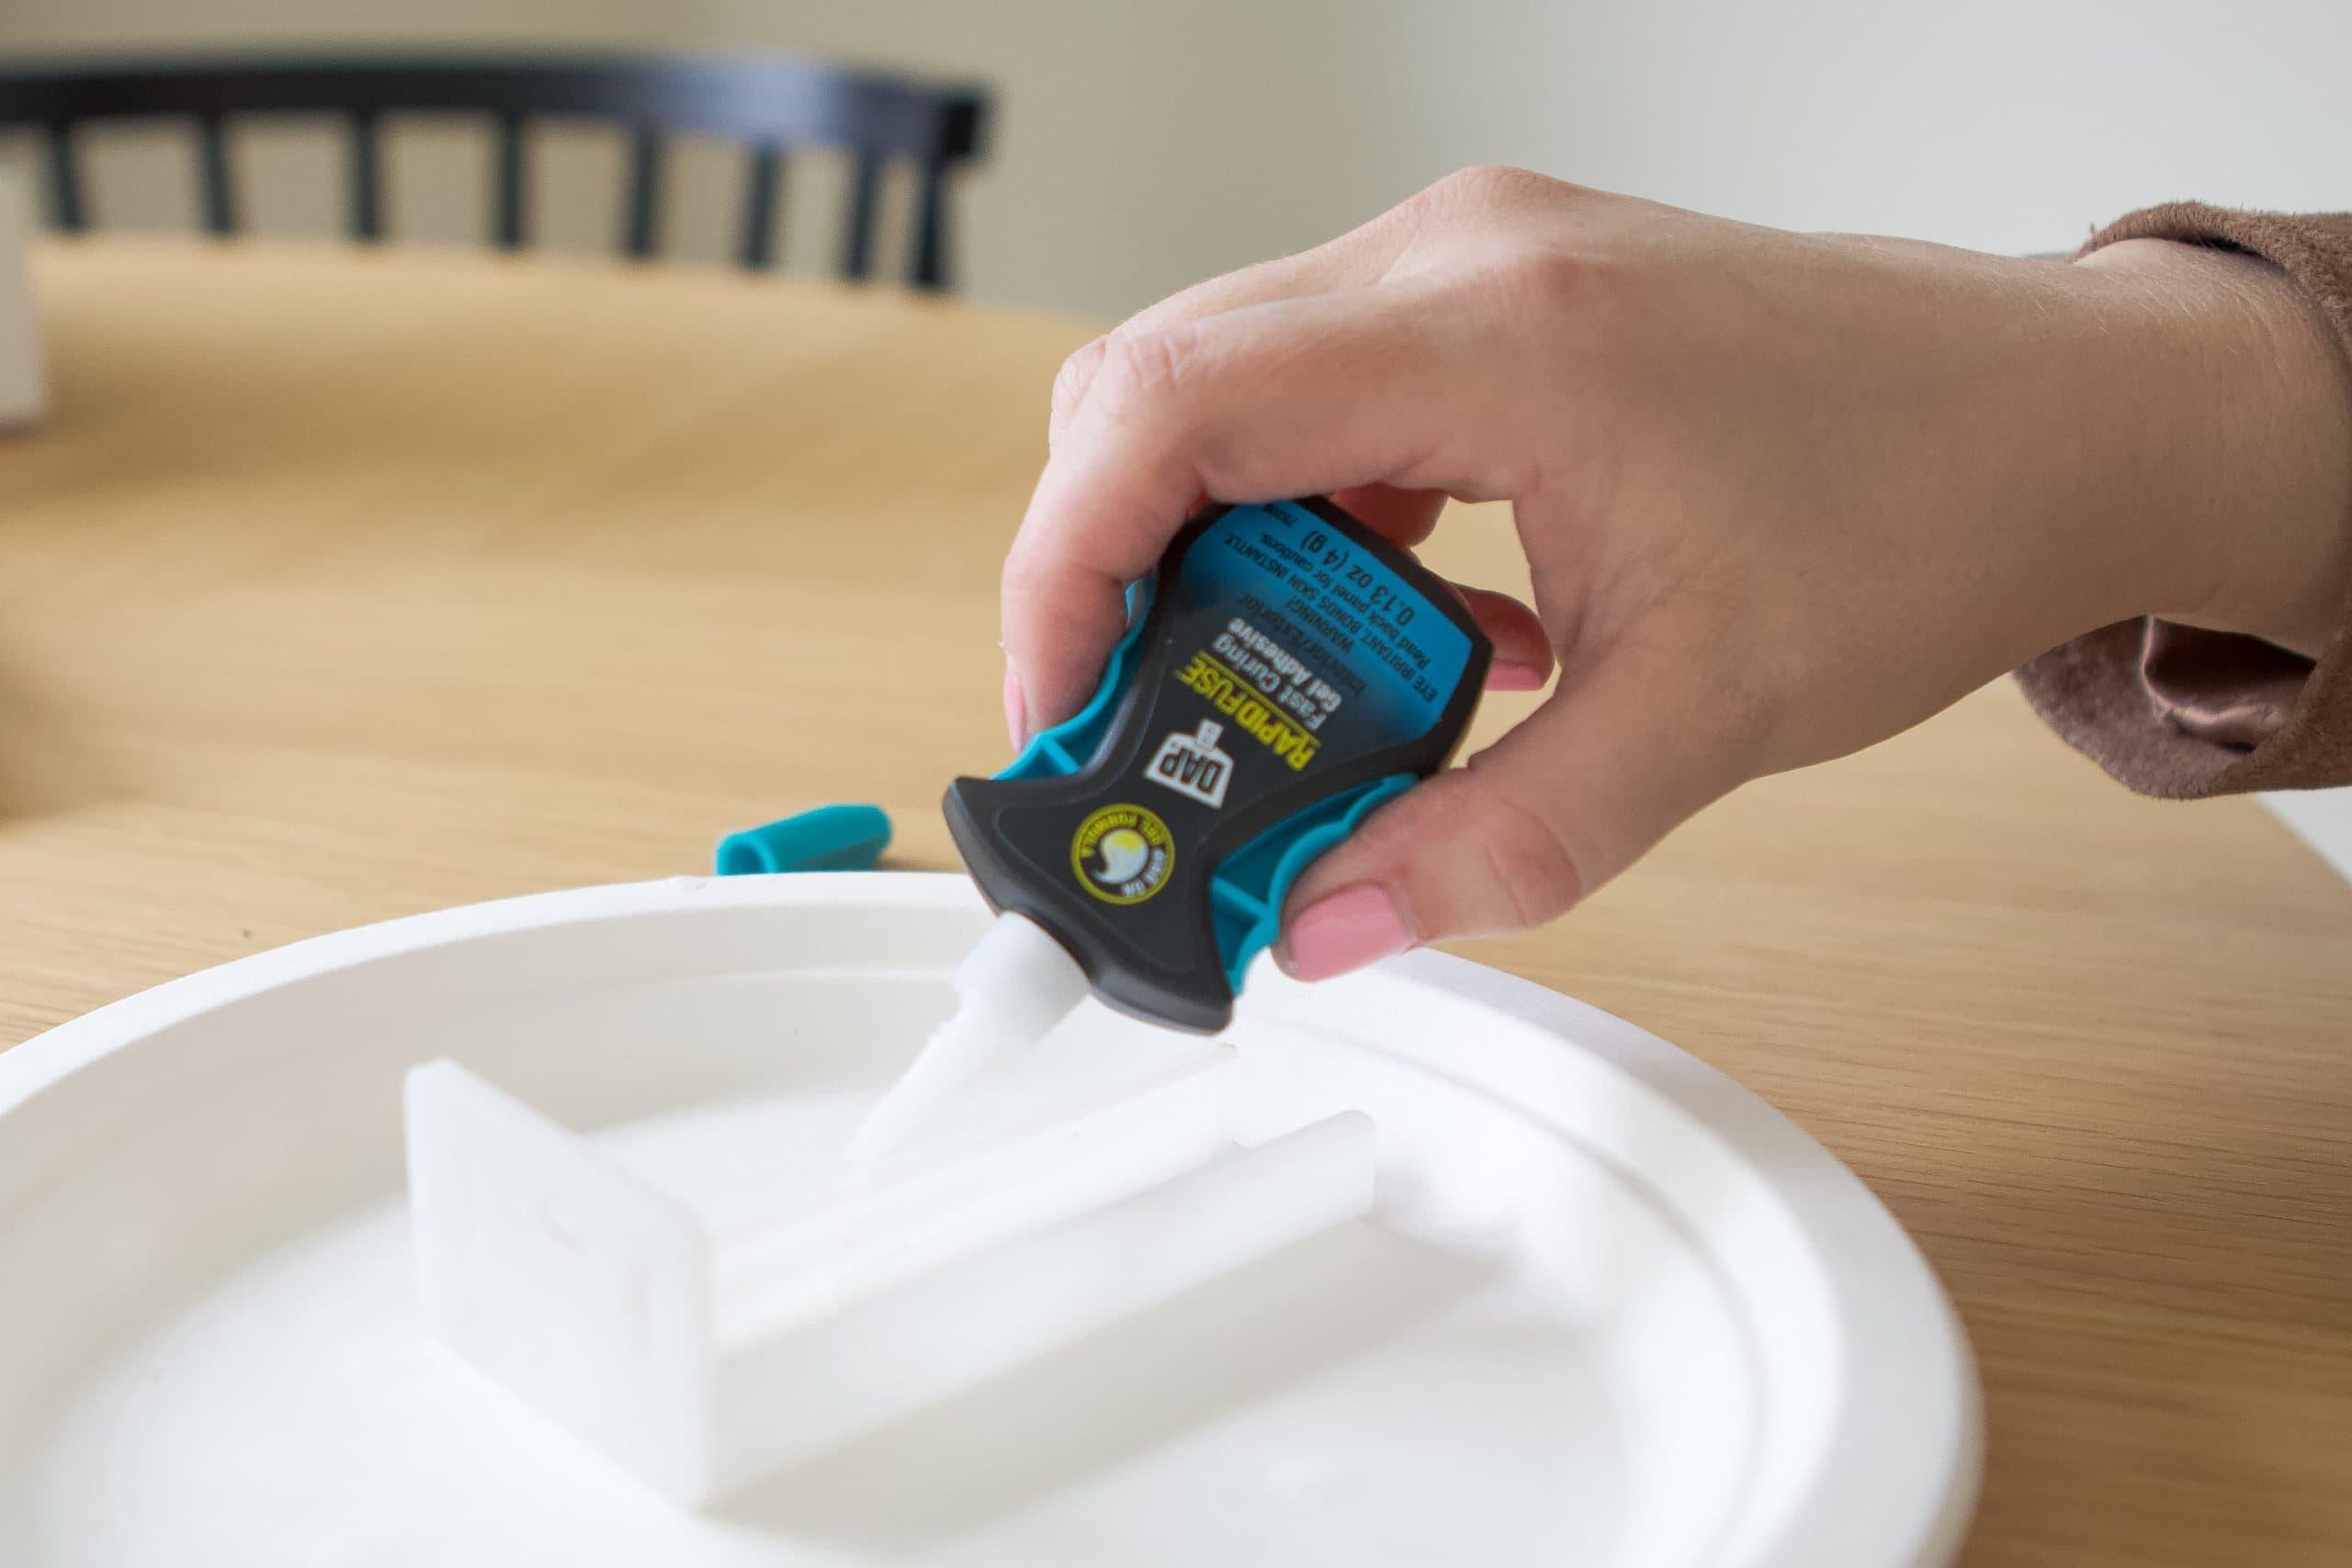 Using super glue to fix plastic